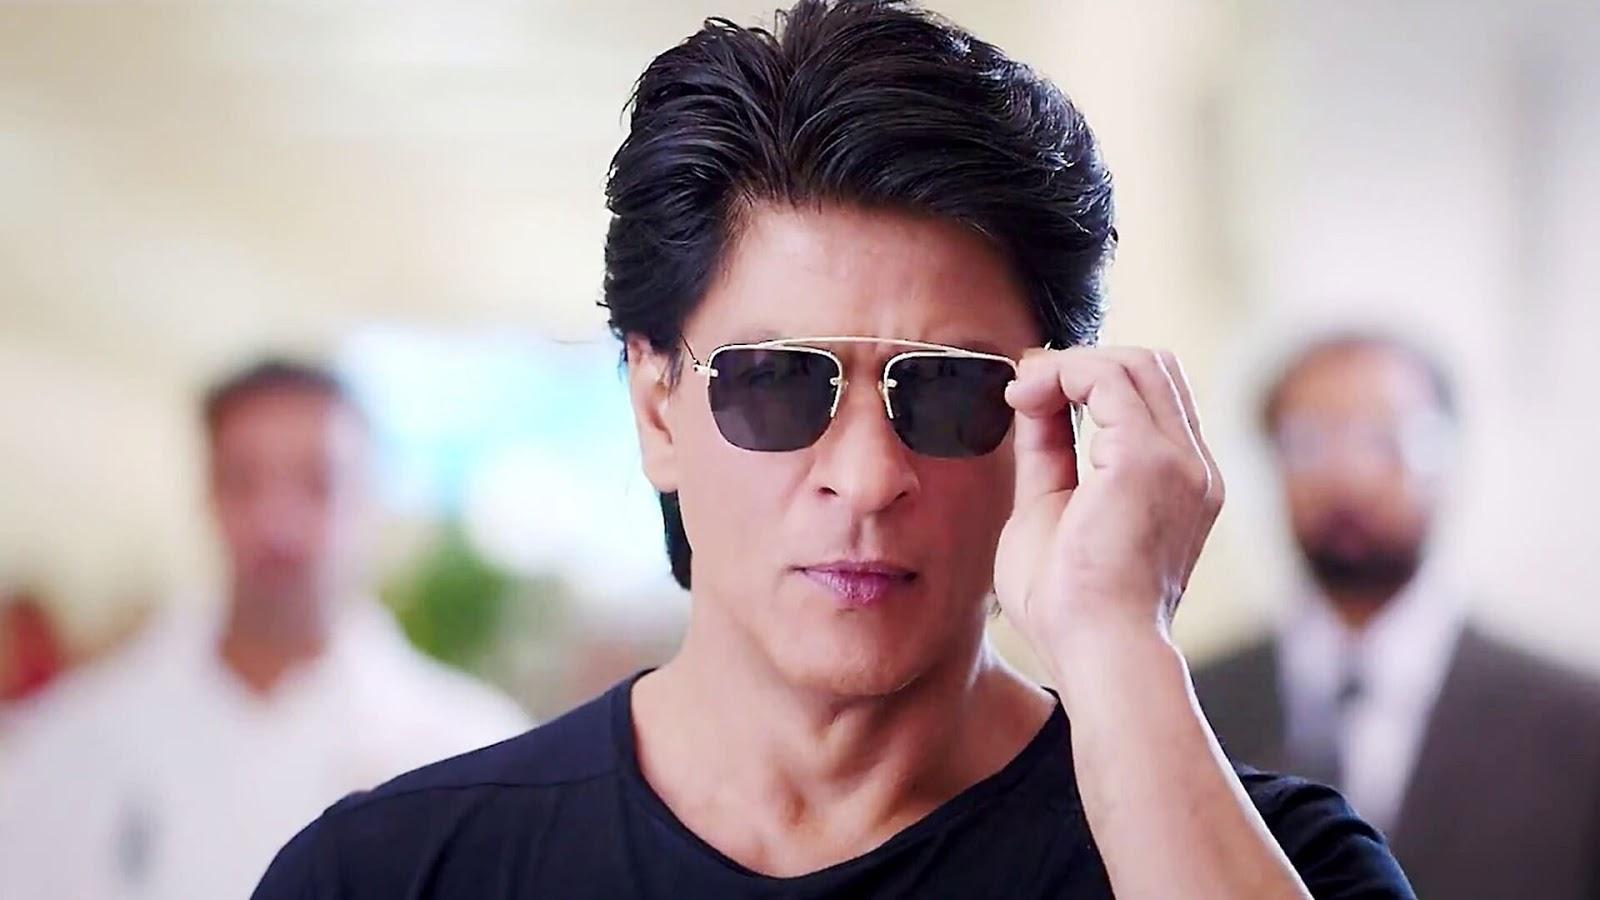 Shahrukh Khan Latest Hd Wallpaperssrk Photosimages Gallery